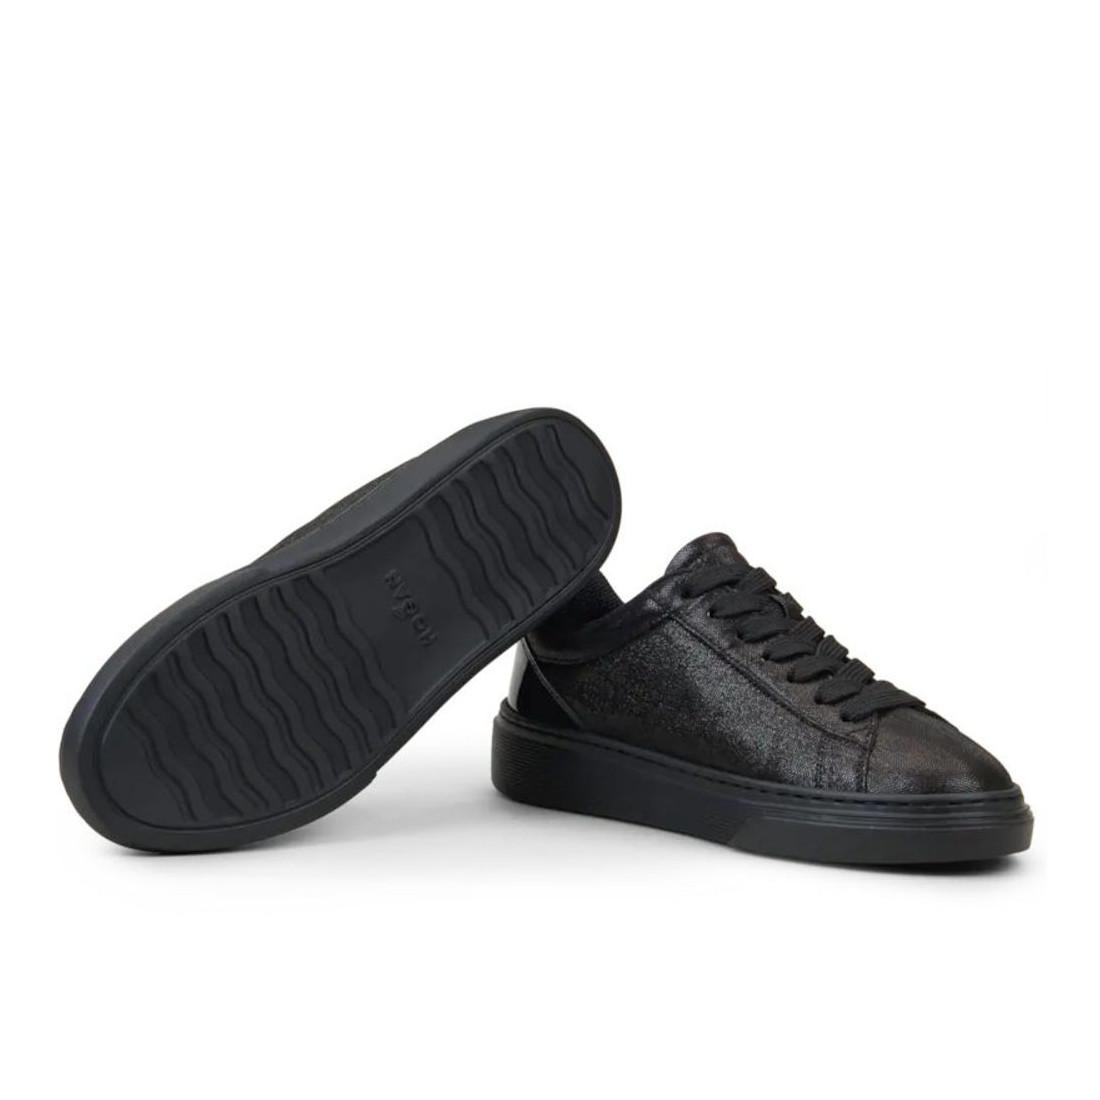 sneakers donna hogan hxw3650j971n58b999 7669